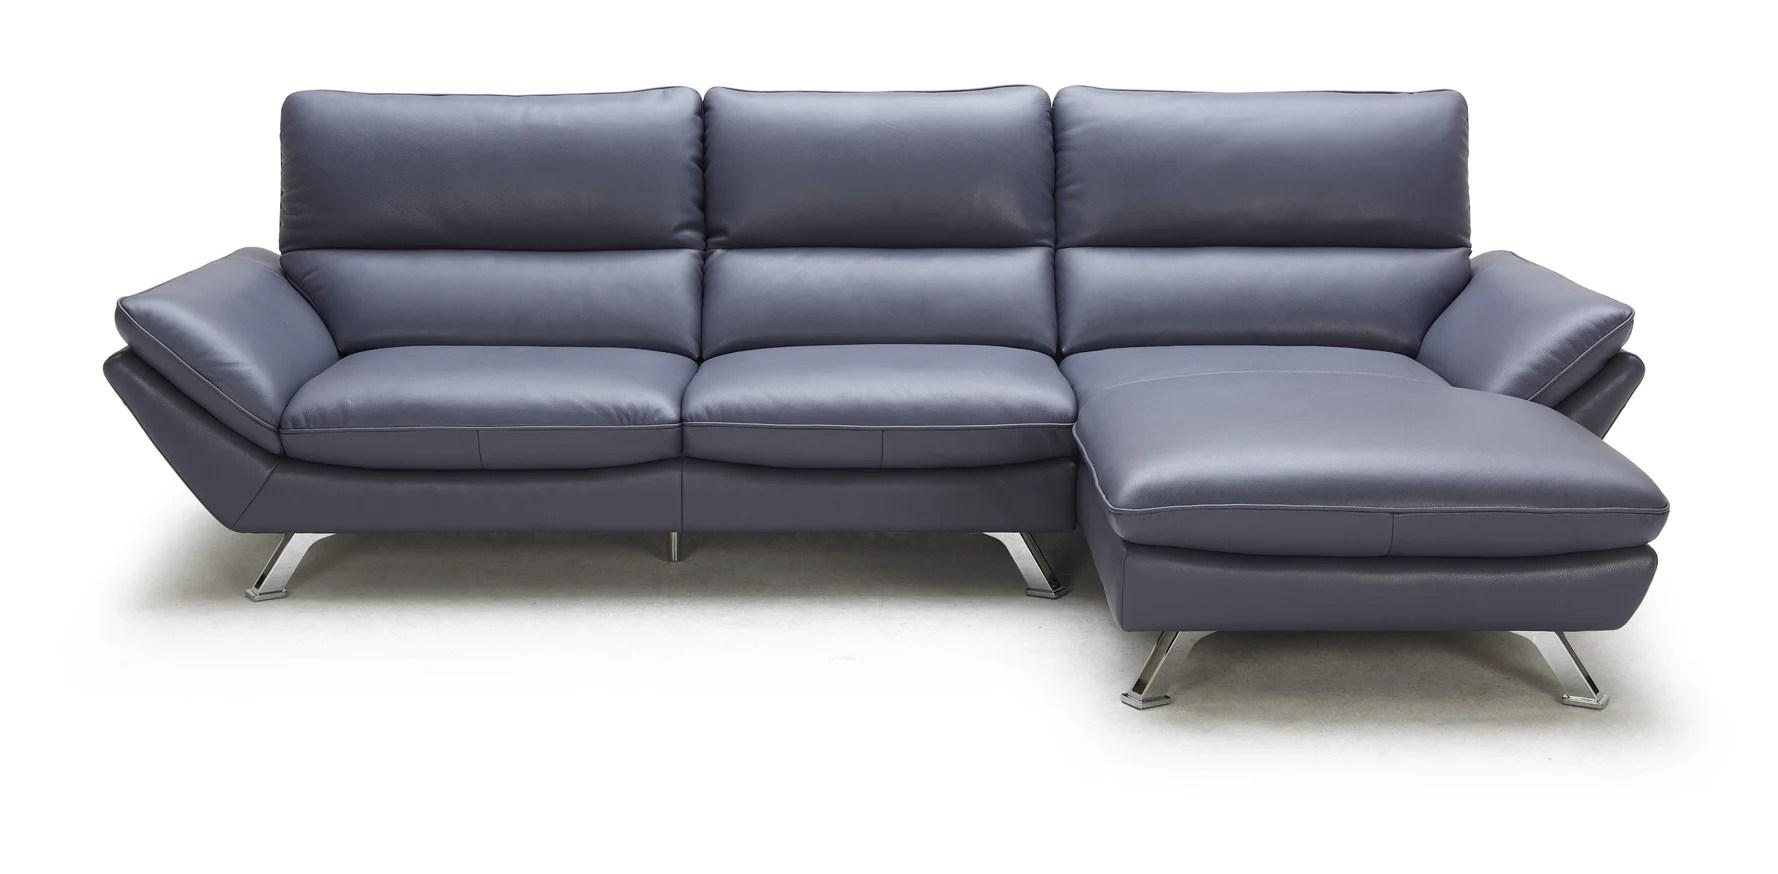 blue leather sofas duresta on gumtree sectional sofa  thesofa